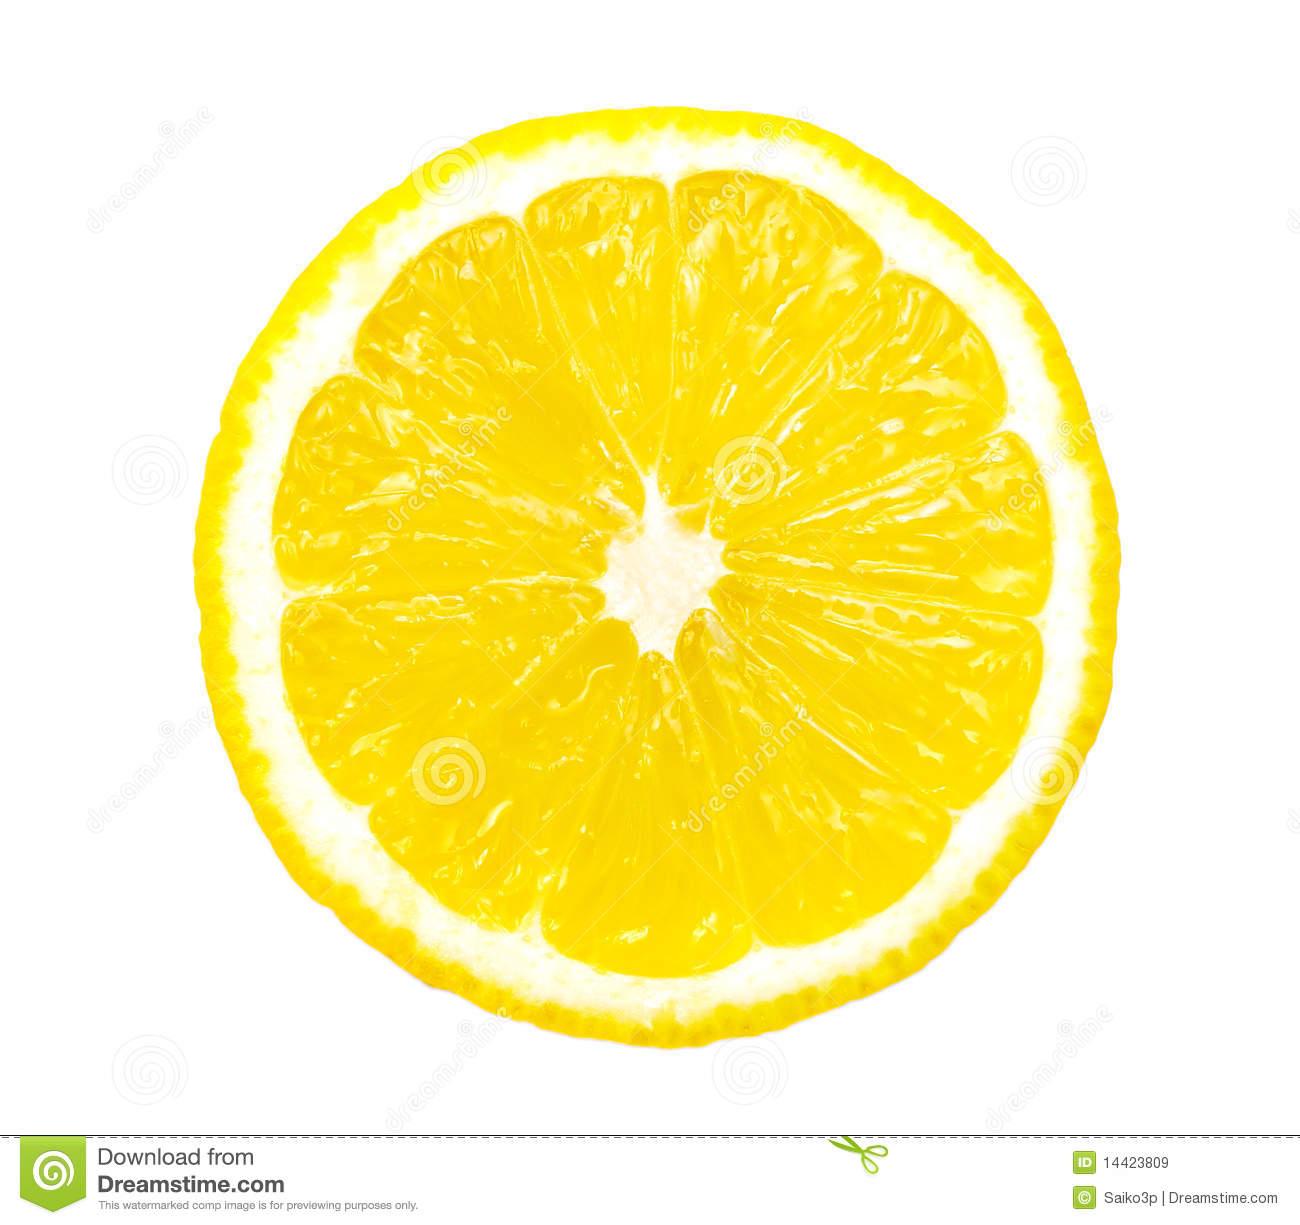 Royalty-Free Stock Photo. Download Lemon Slice PlusPng.com  - Free PNG Lemon Slice